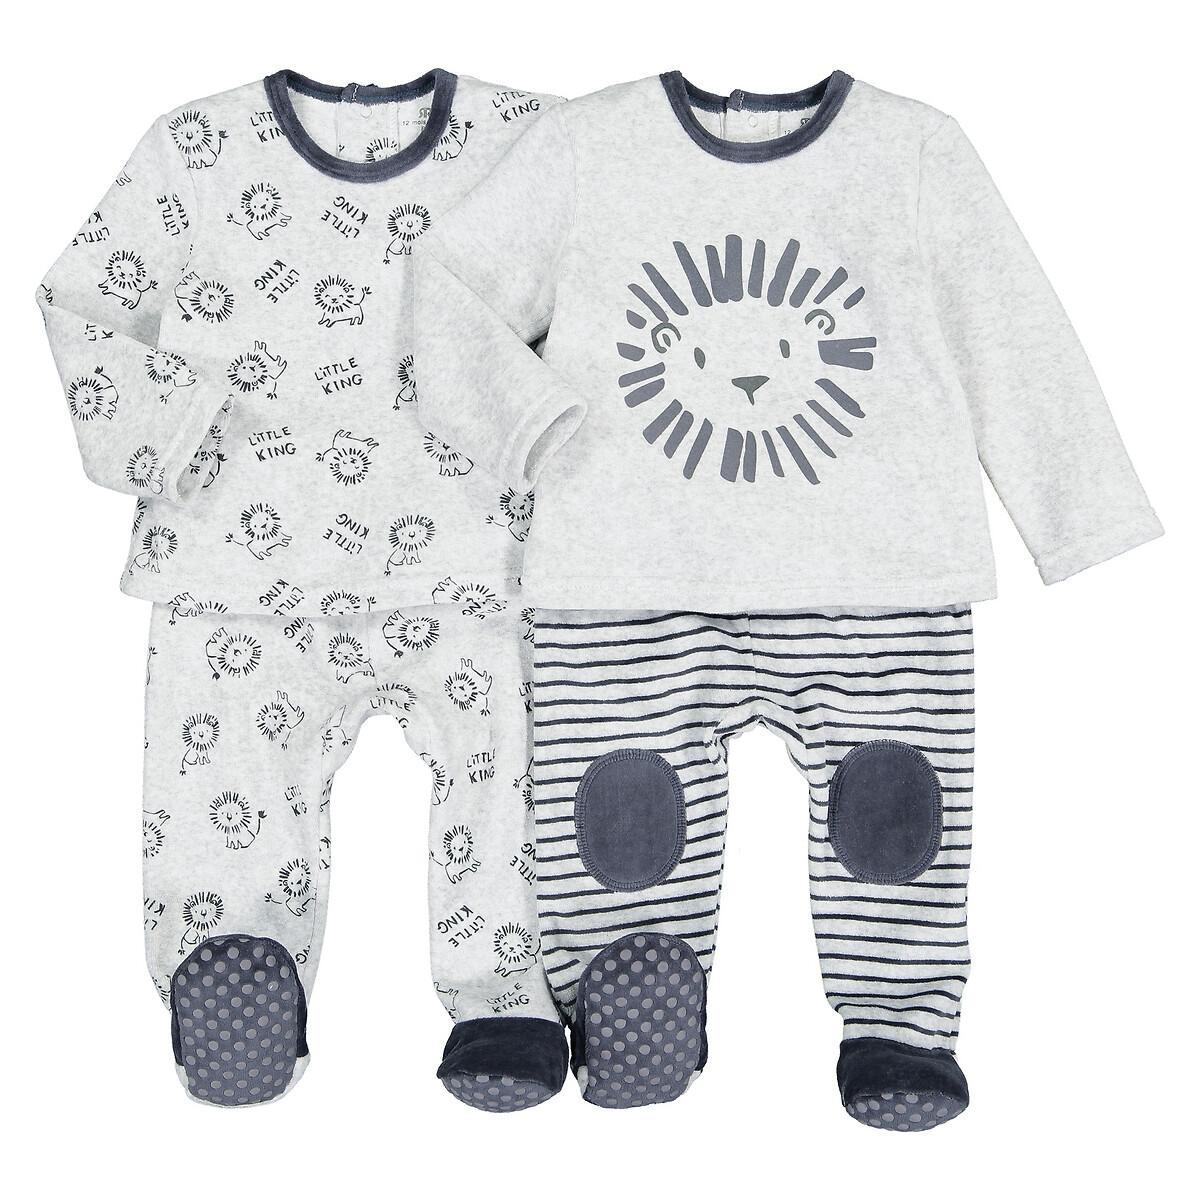 Комплект из 2 раздельных пижам LaRedoute Из велюра 1 мес-4 лет 3 мес. - 60 см серый пижама laredoute с носочками из велюра 0 мес 3 года 3 мес 60 см серый